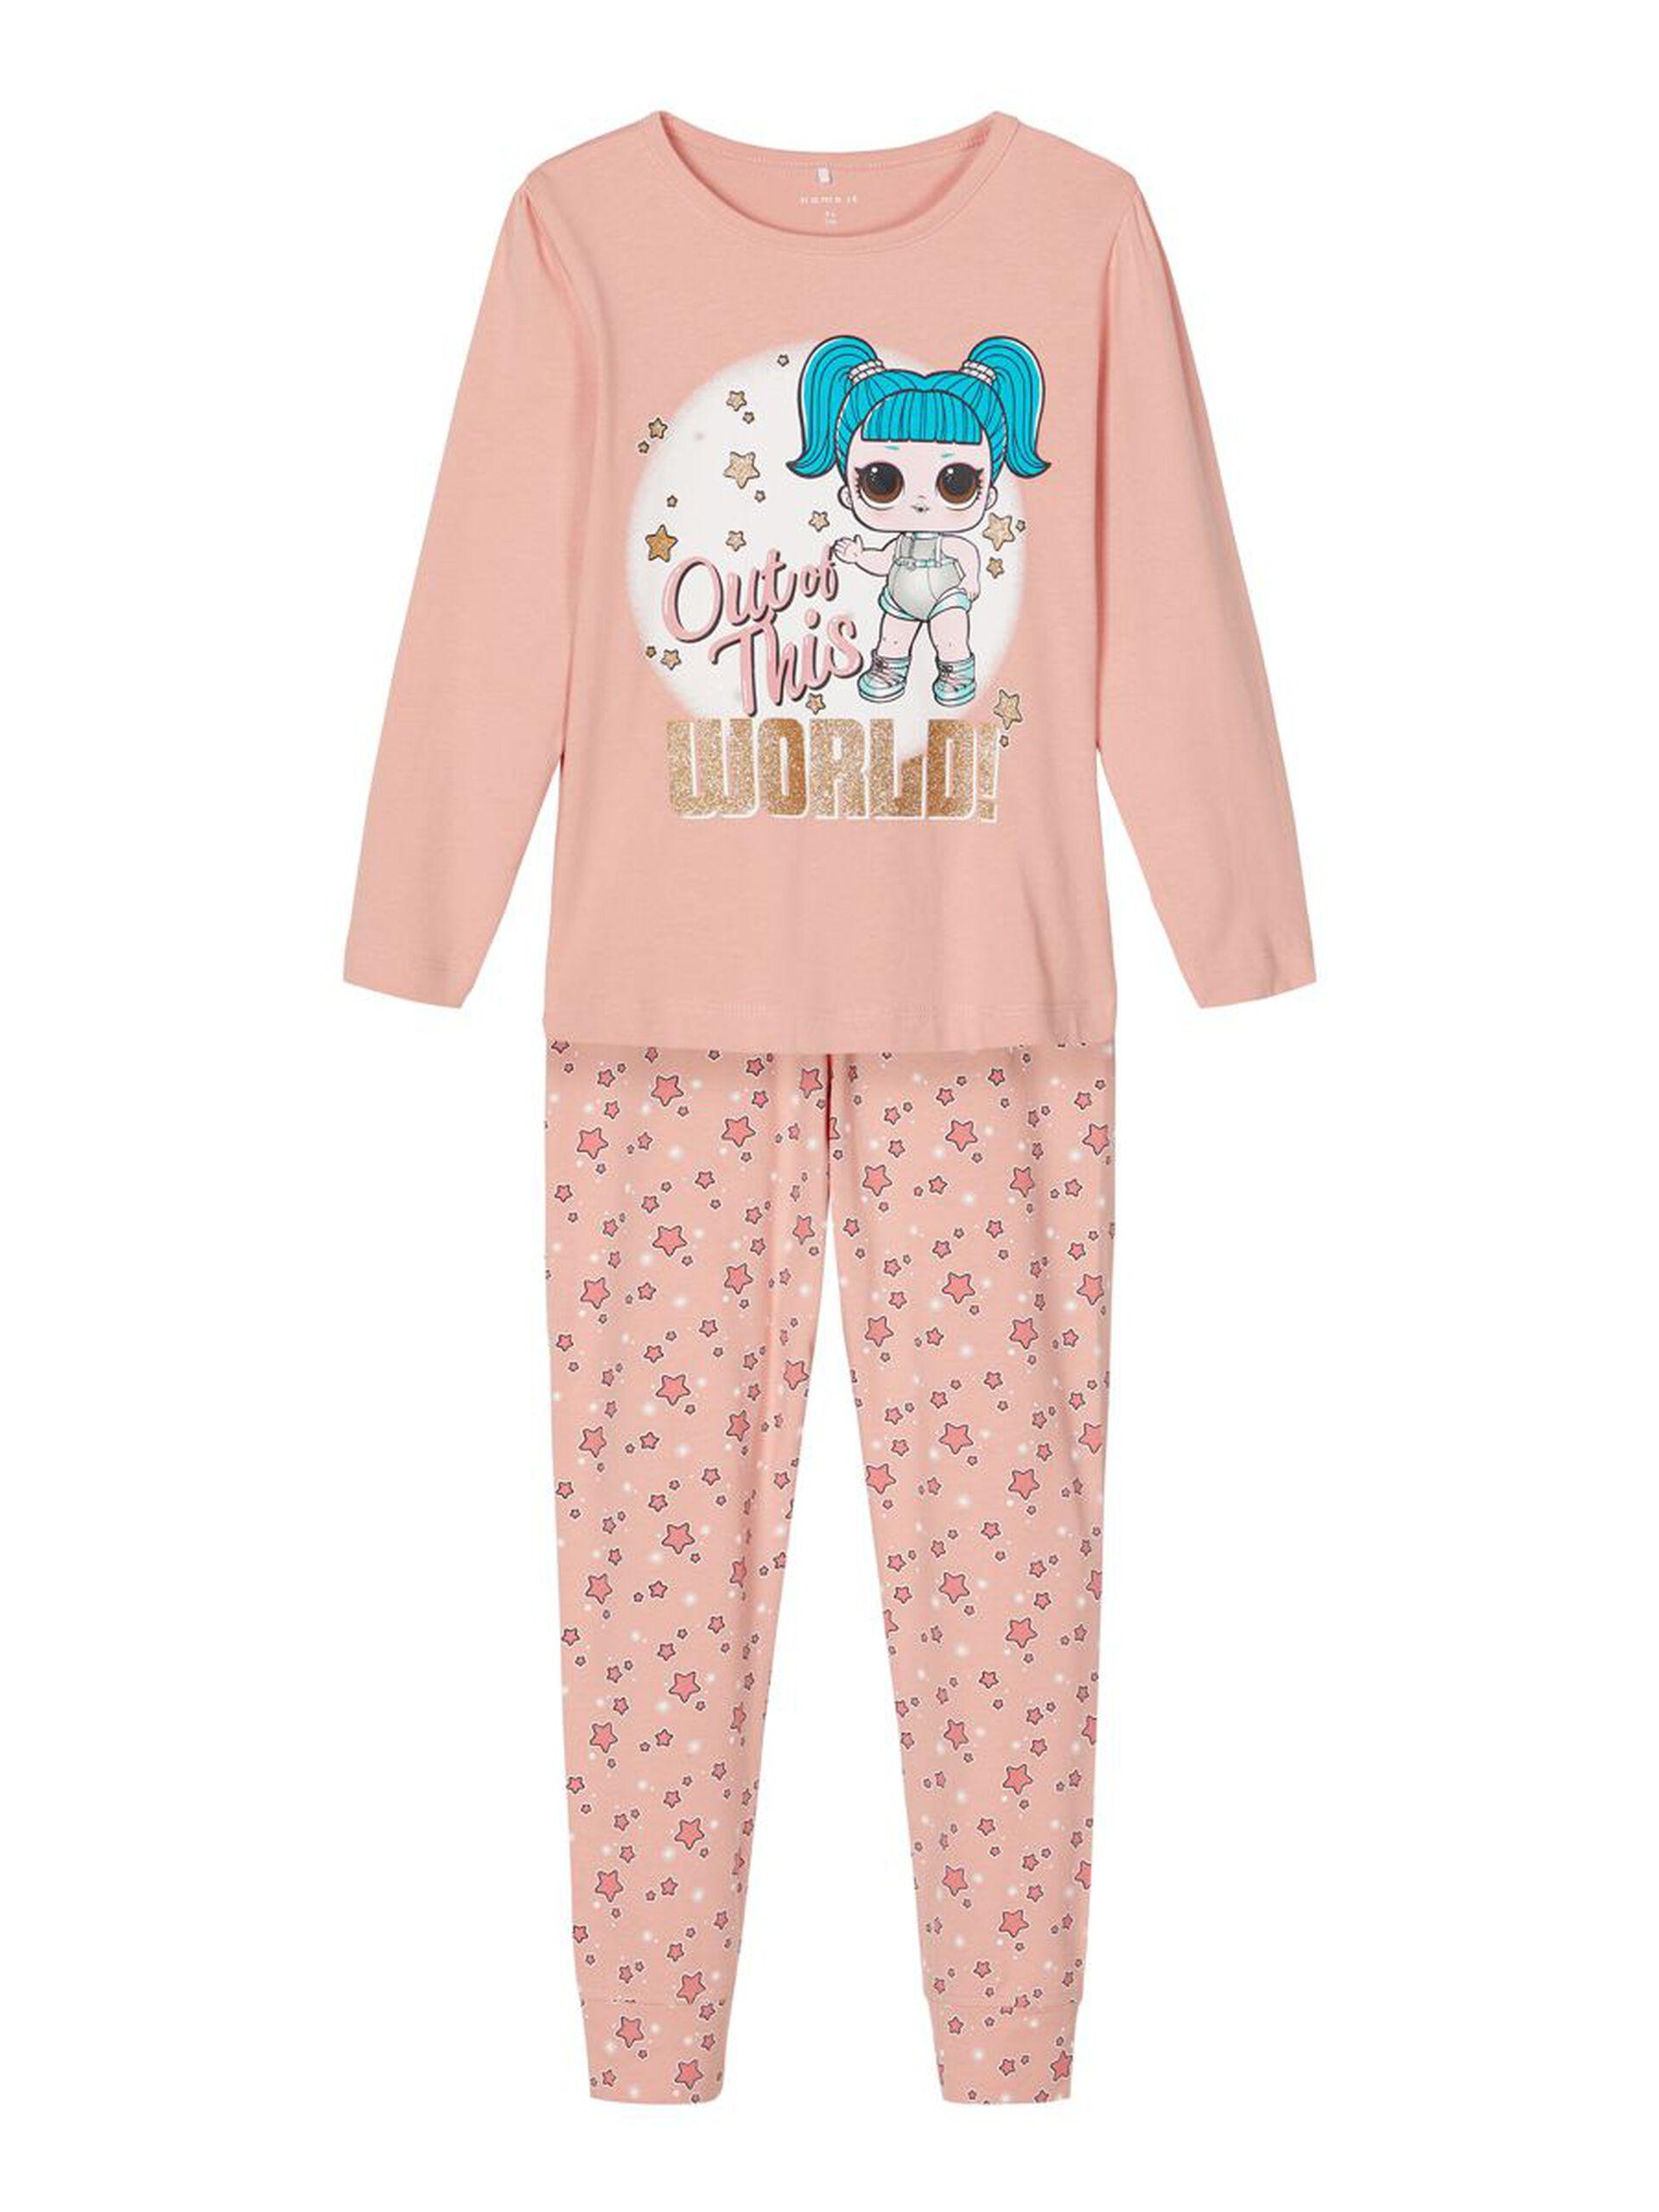 LOL pysjamas til barn – Nattøy LOL rosa pysjamas  – Mio Trend